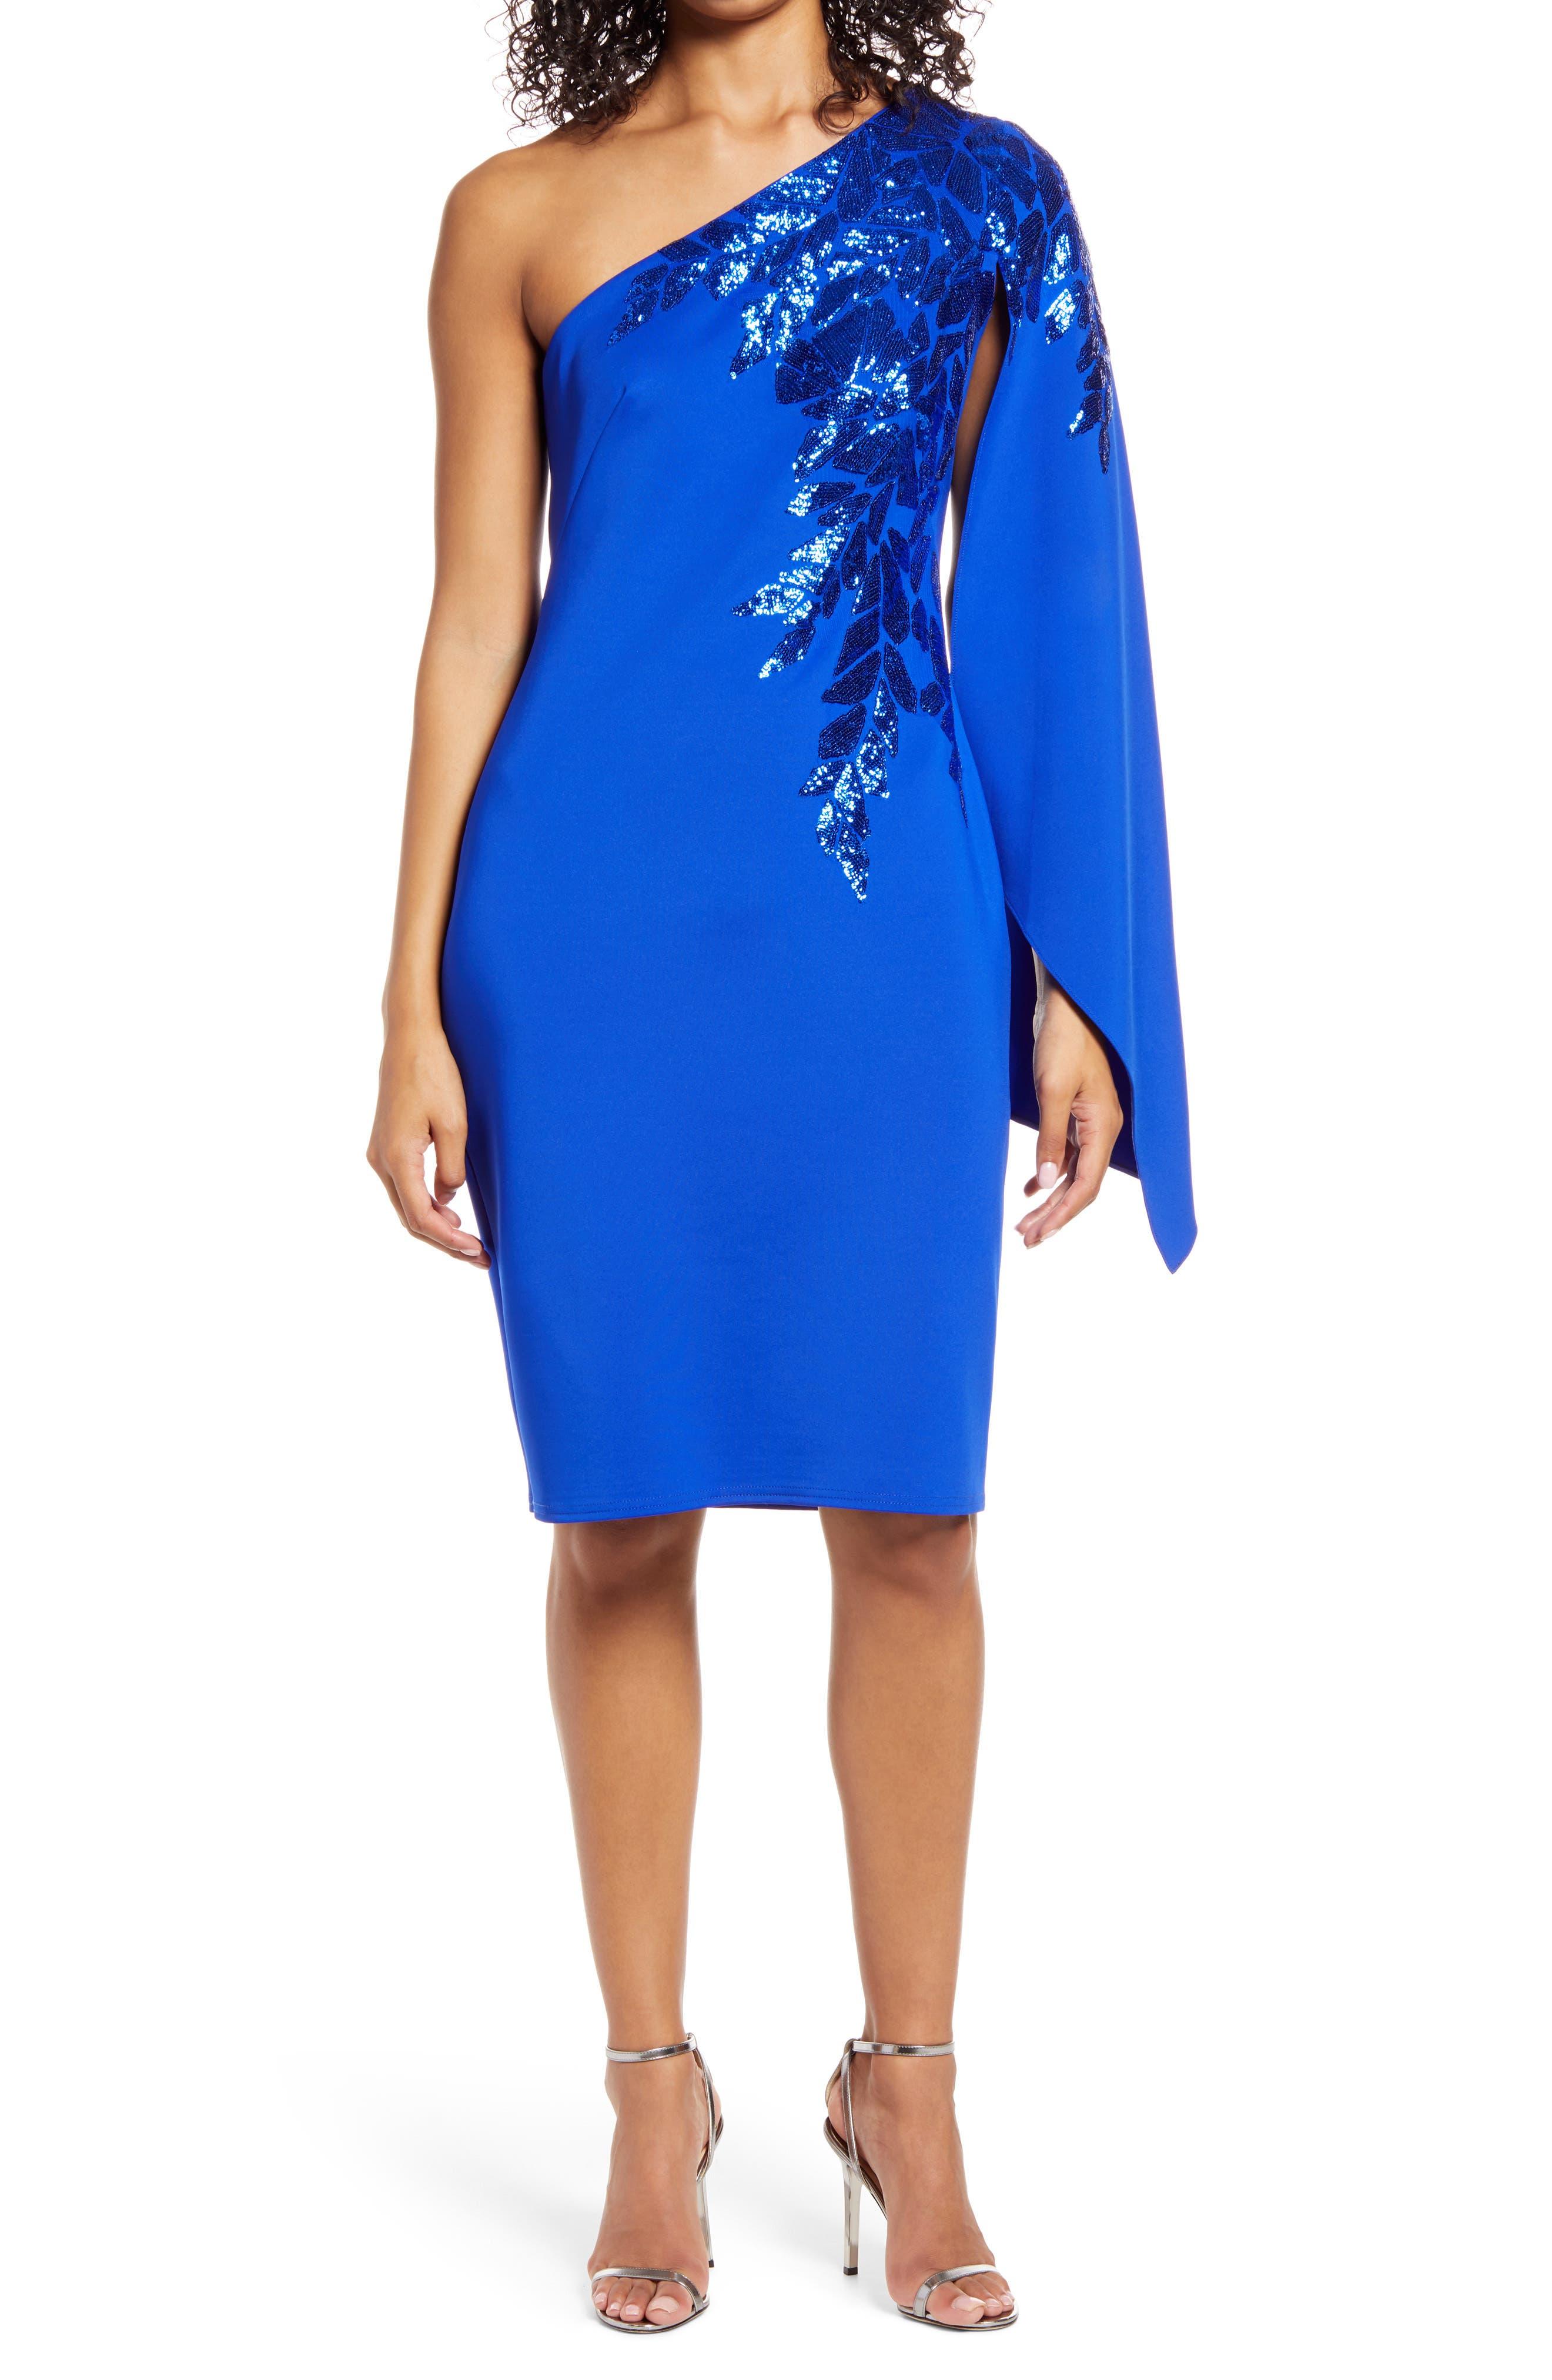 80s Dresses | Casual to Party Dresses Womens Tadashi Shoji Sequin One-Shoulder Cocktail Dress Size X-Small - Blue $308.00 AT vintagedancer.com